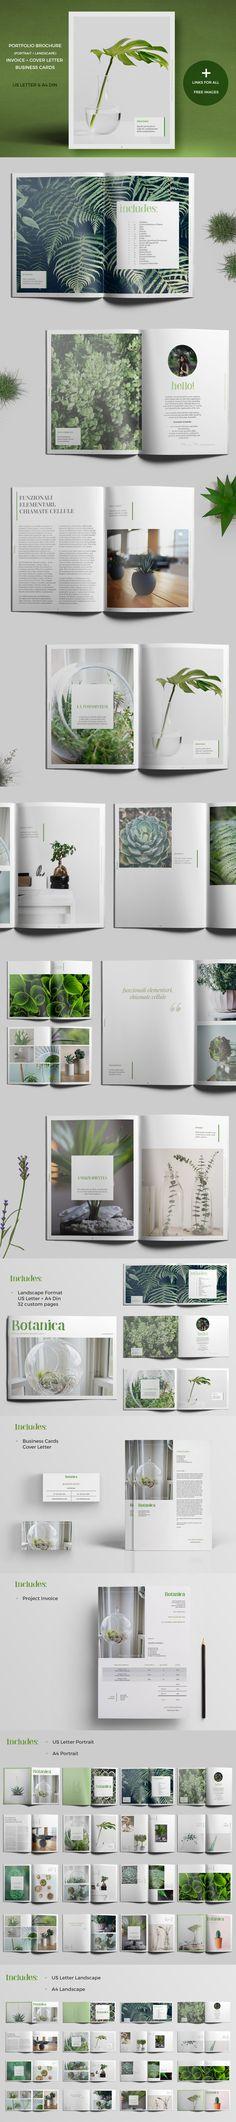 Botanica - Portfolio / Photobook / Brochure Template InDesign INDD